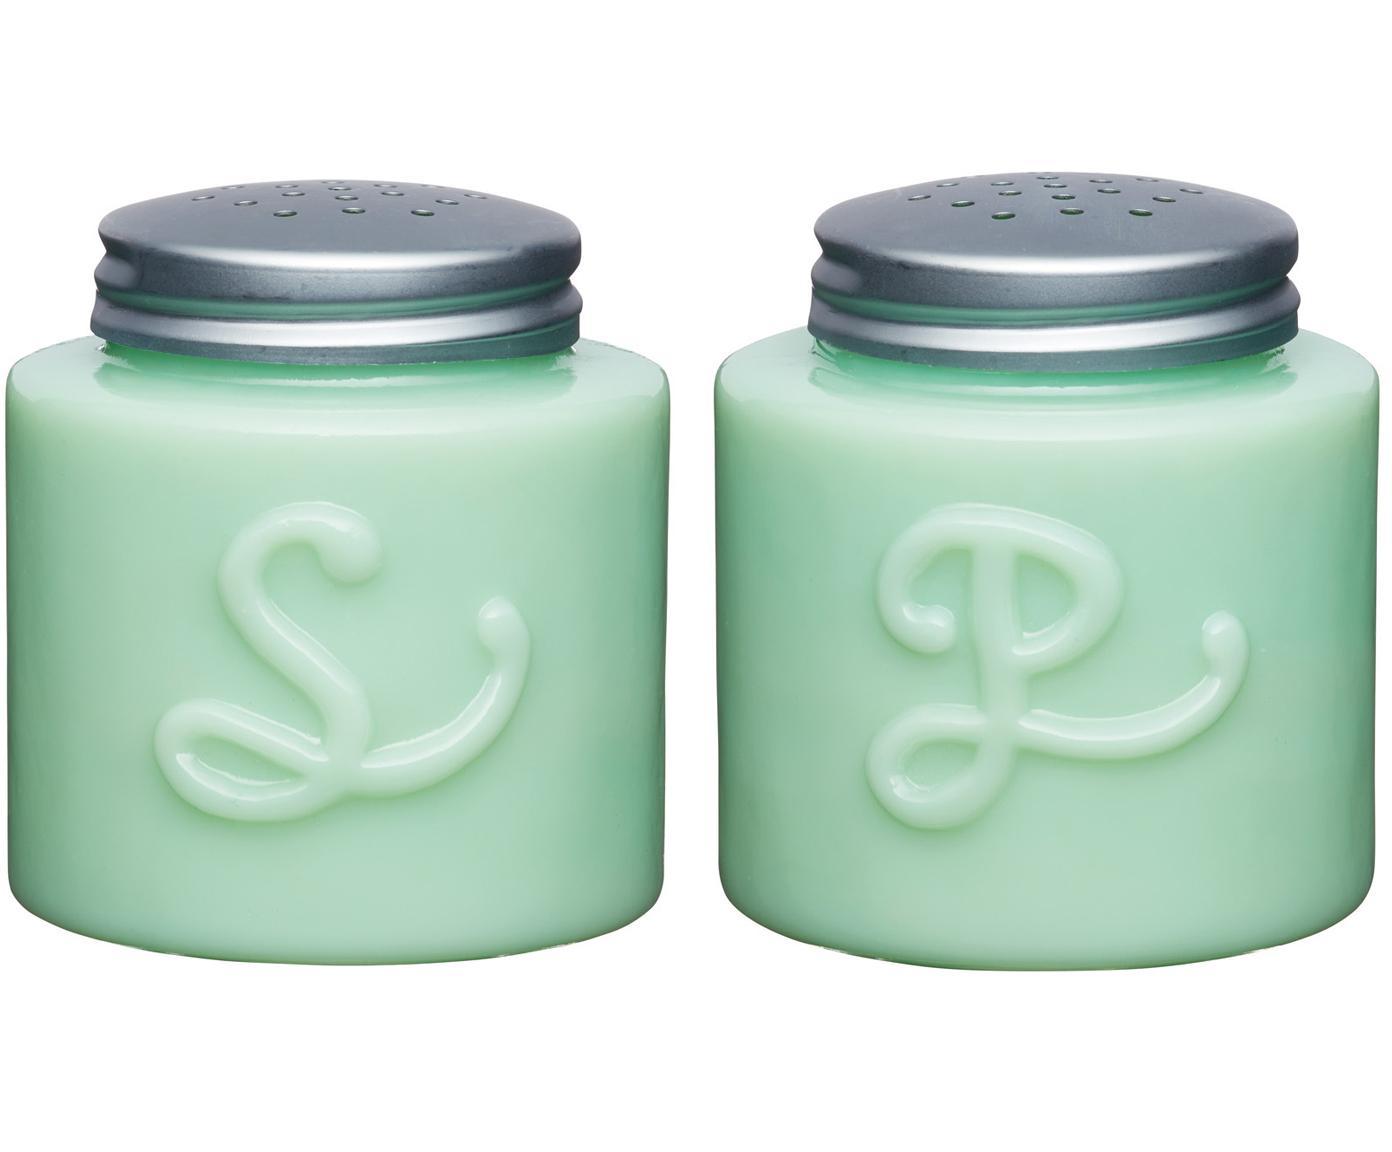 Zout- en peperstrooierset Mint, 2-delig, Glas, Mintgroen, Ø 6 x H 13 cm